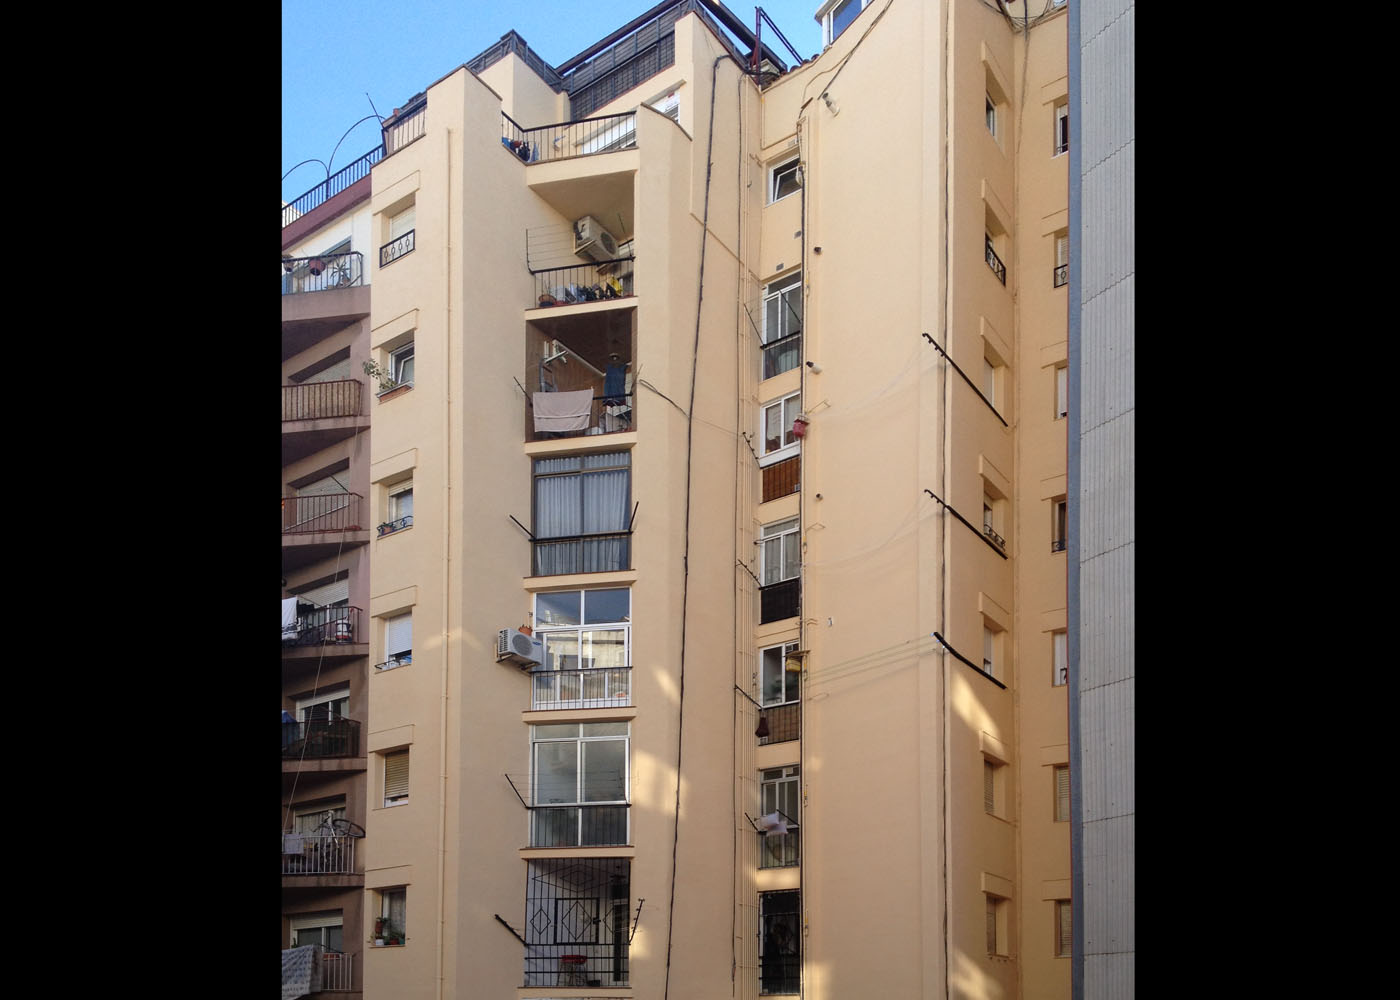 rehabilitacion-vivienda-plurifamiliar-passeig-de-lluis-companys-6-barcelona-05